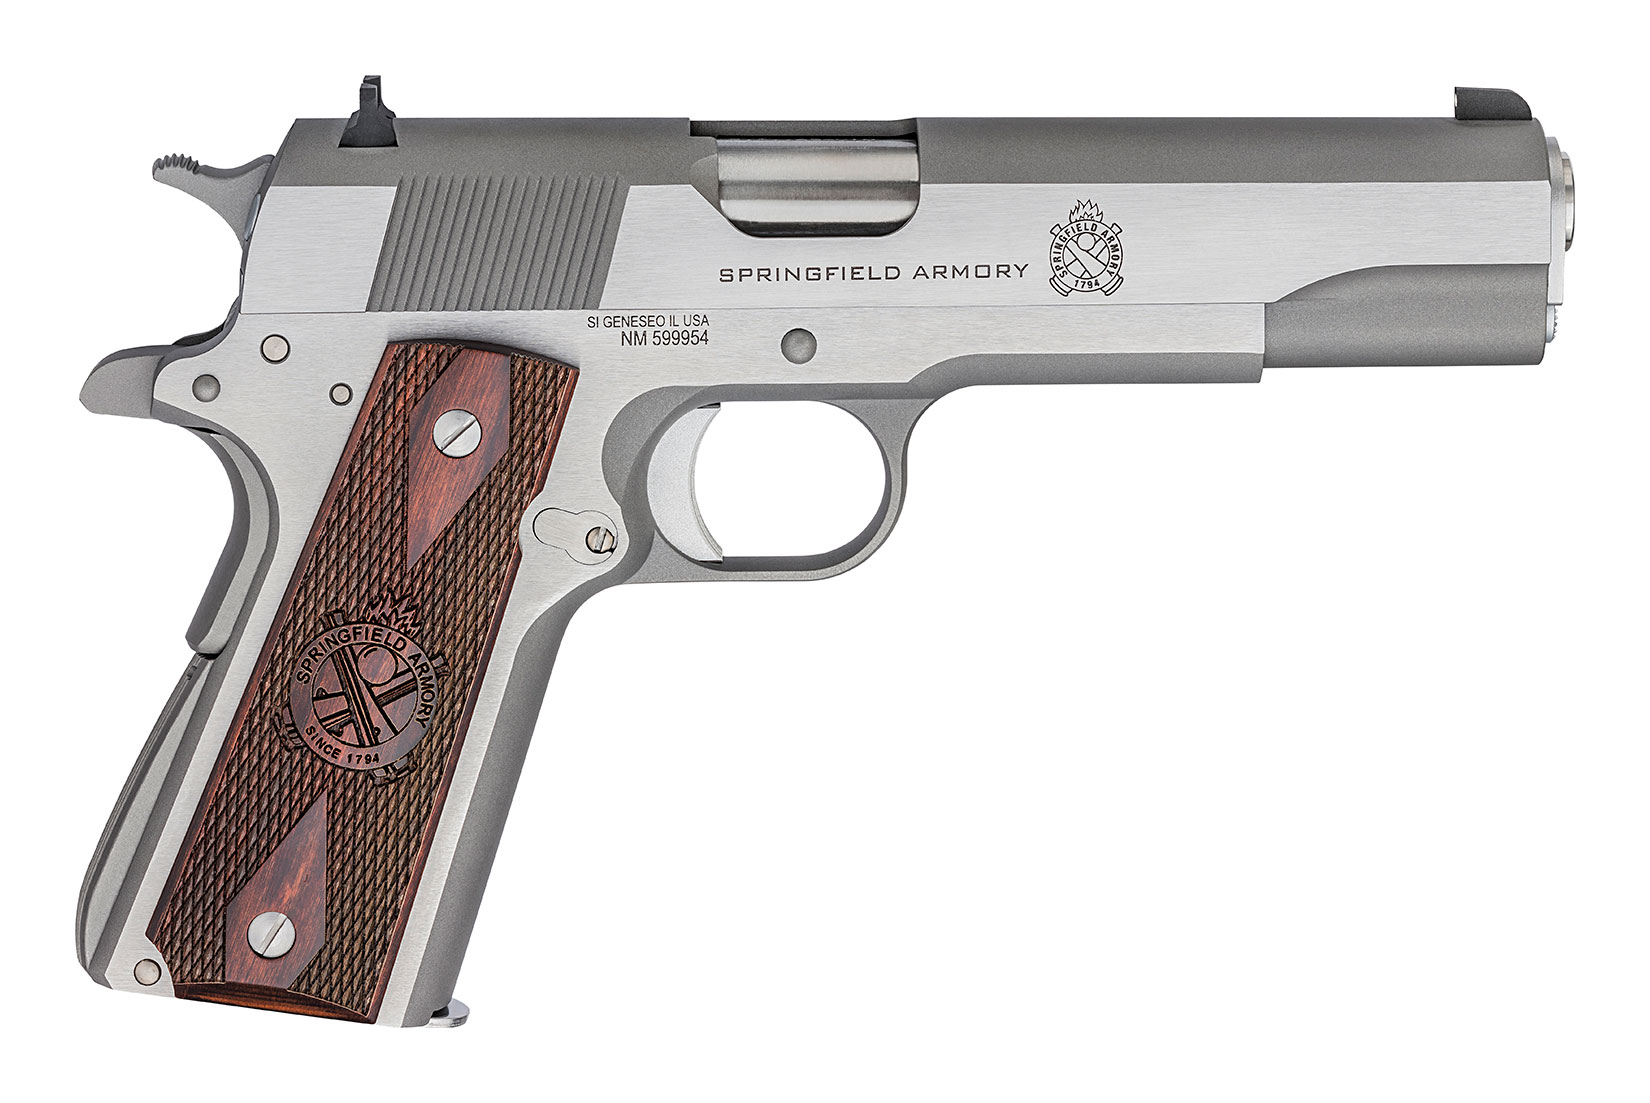 Springfield Armory MIL-SPEC STAINLESS STEEL 45 ACP